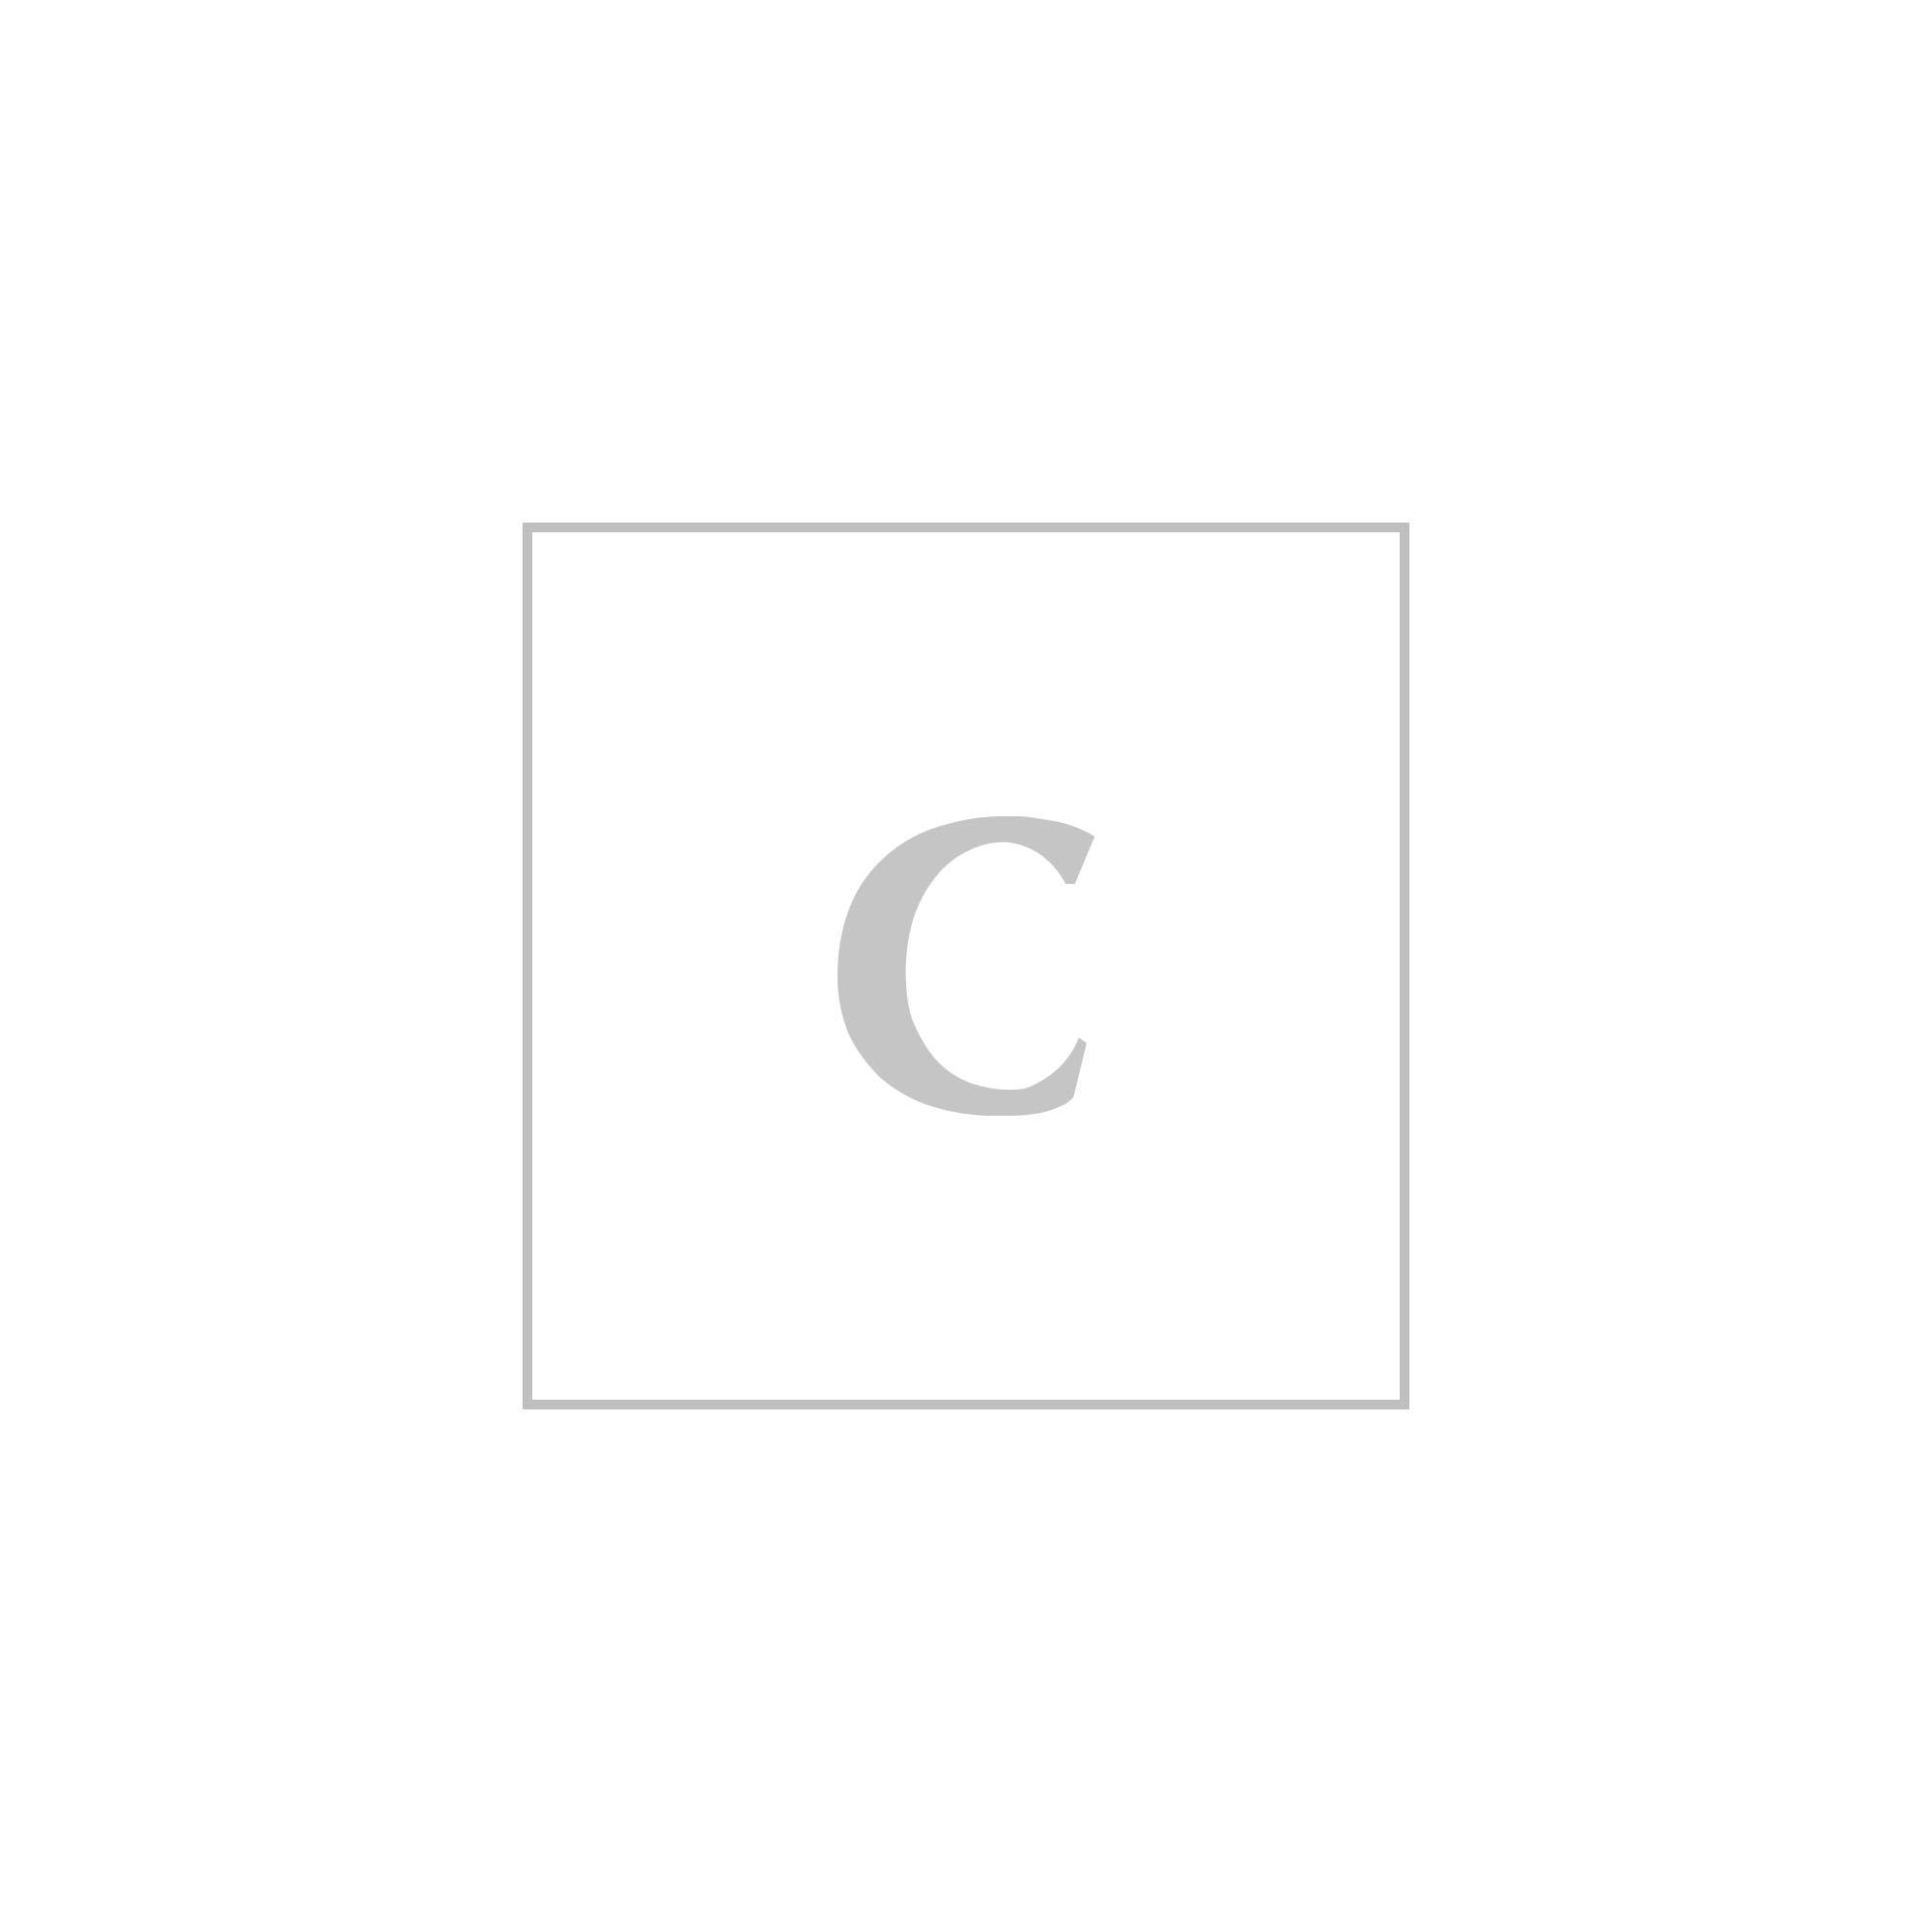 Missoni canotta/top